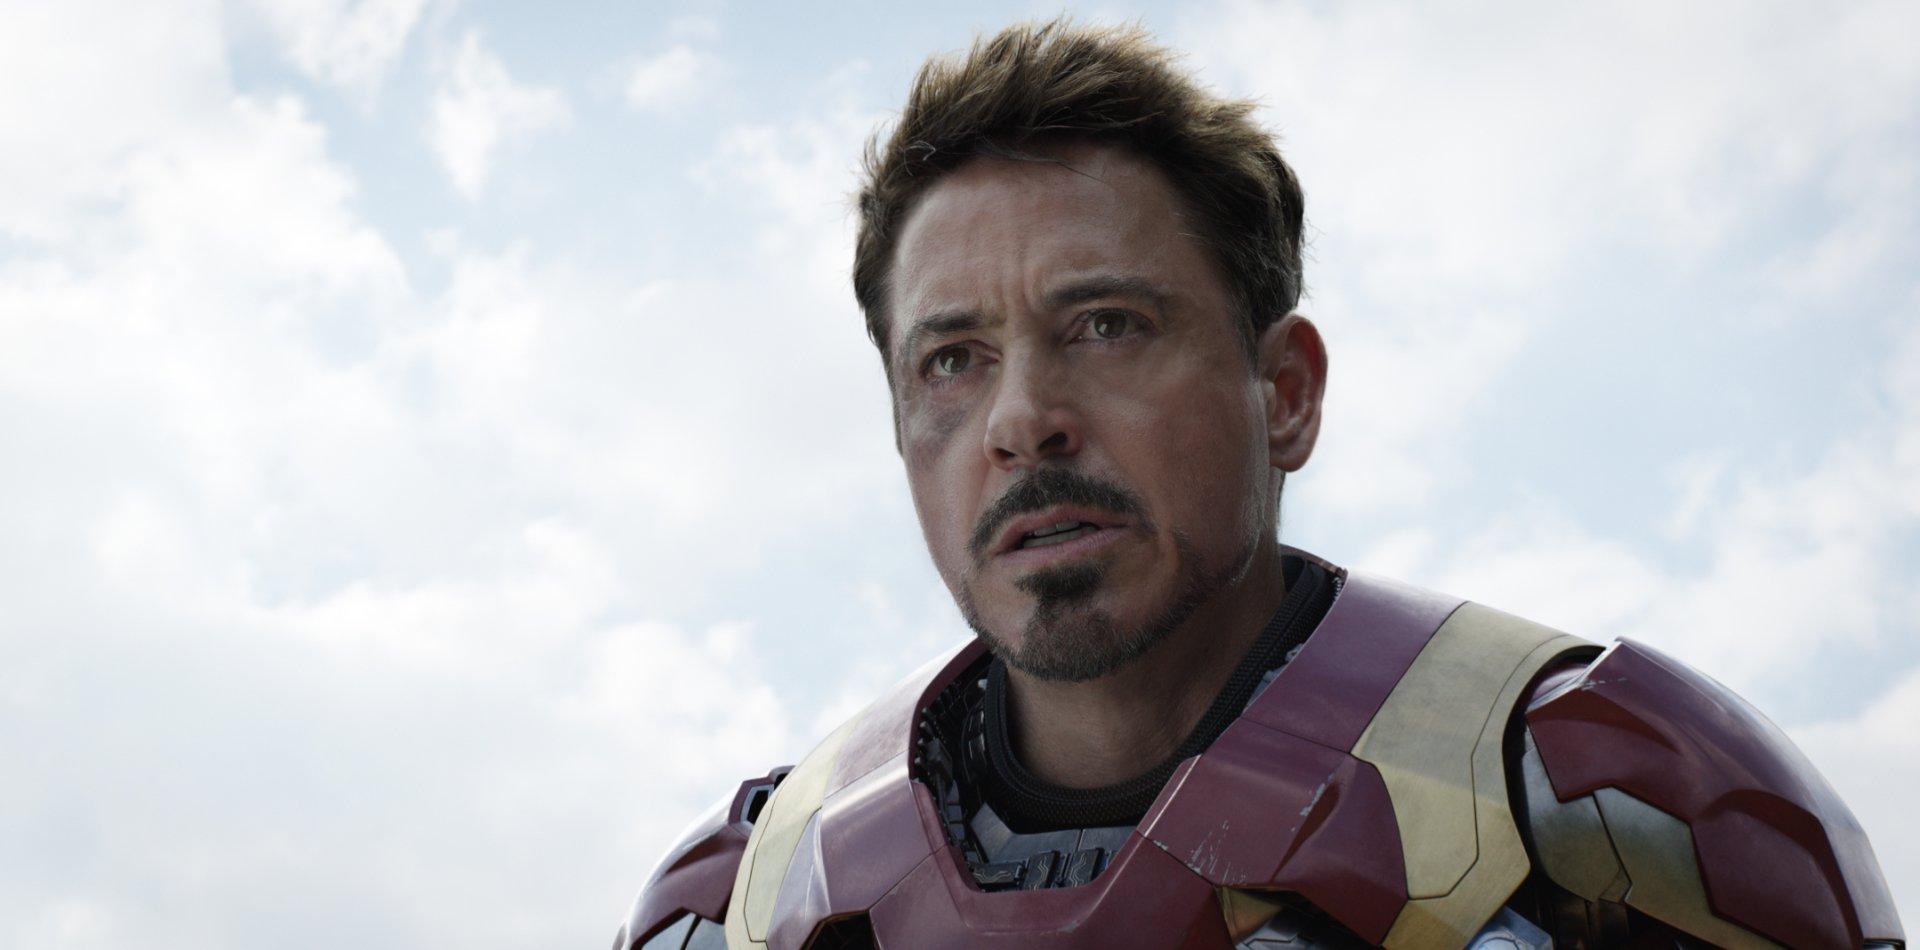 Movie - Captain America: Civil War  Robert Downey Jr. Iron Man Wallpaper